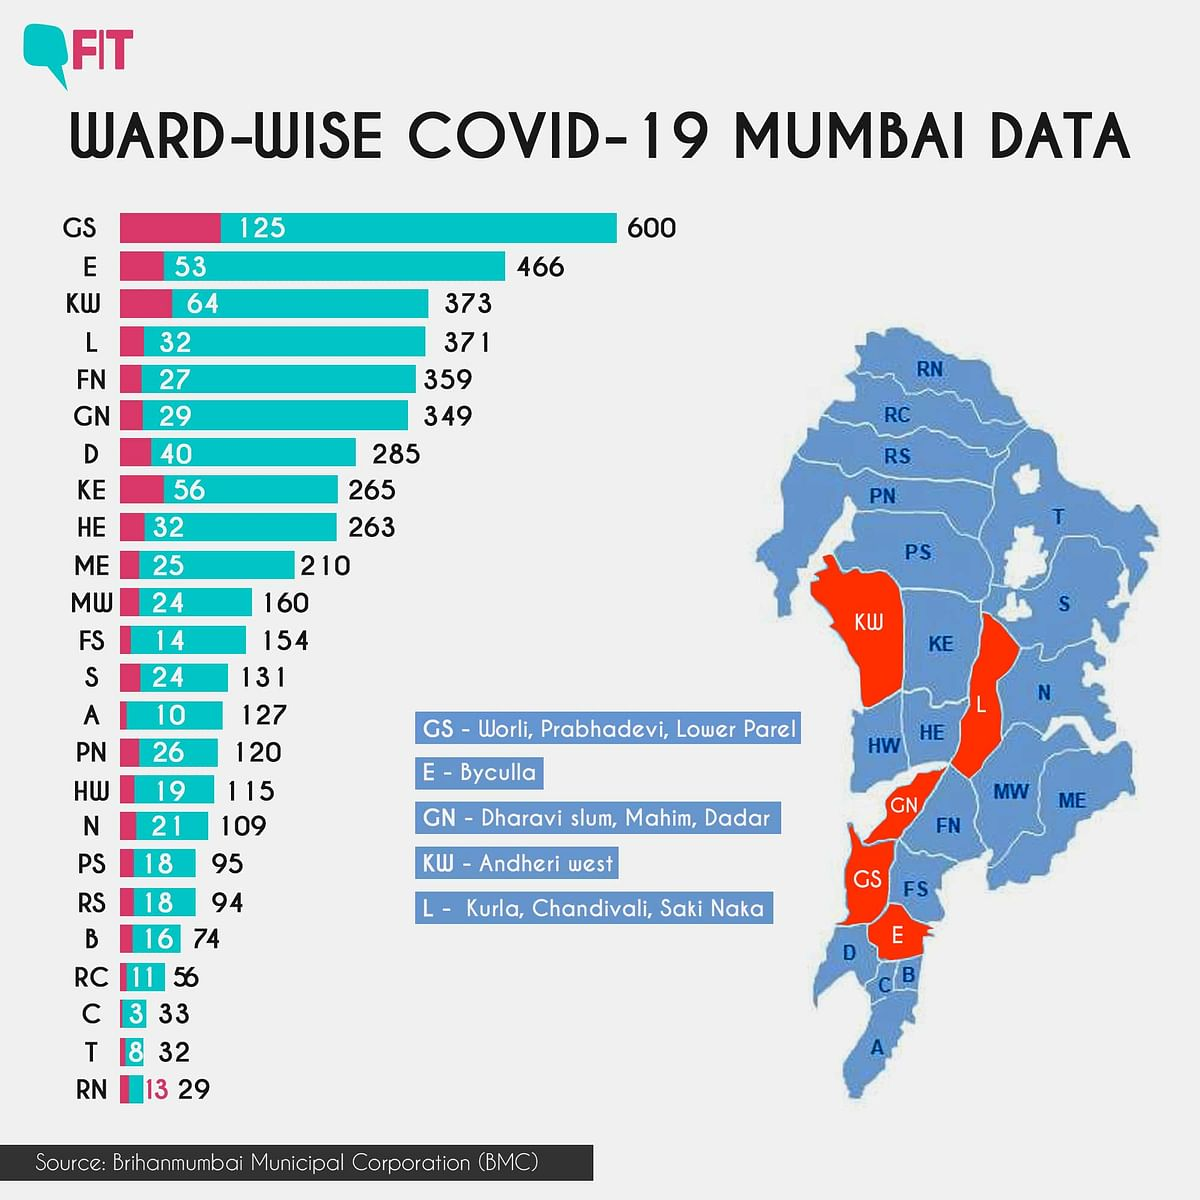 Ward-wise COVID-19 Mumbai data as of 25 April.